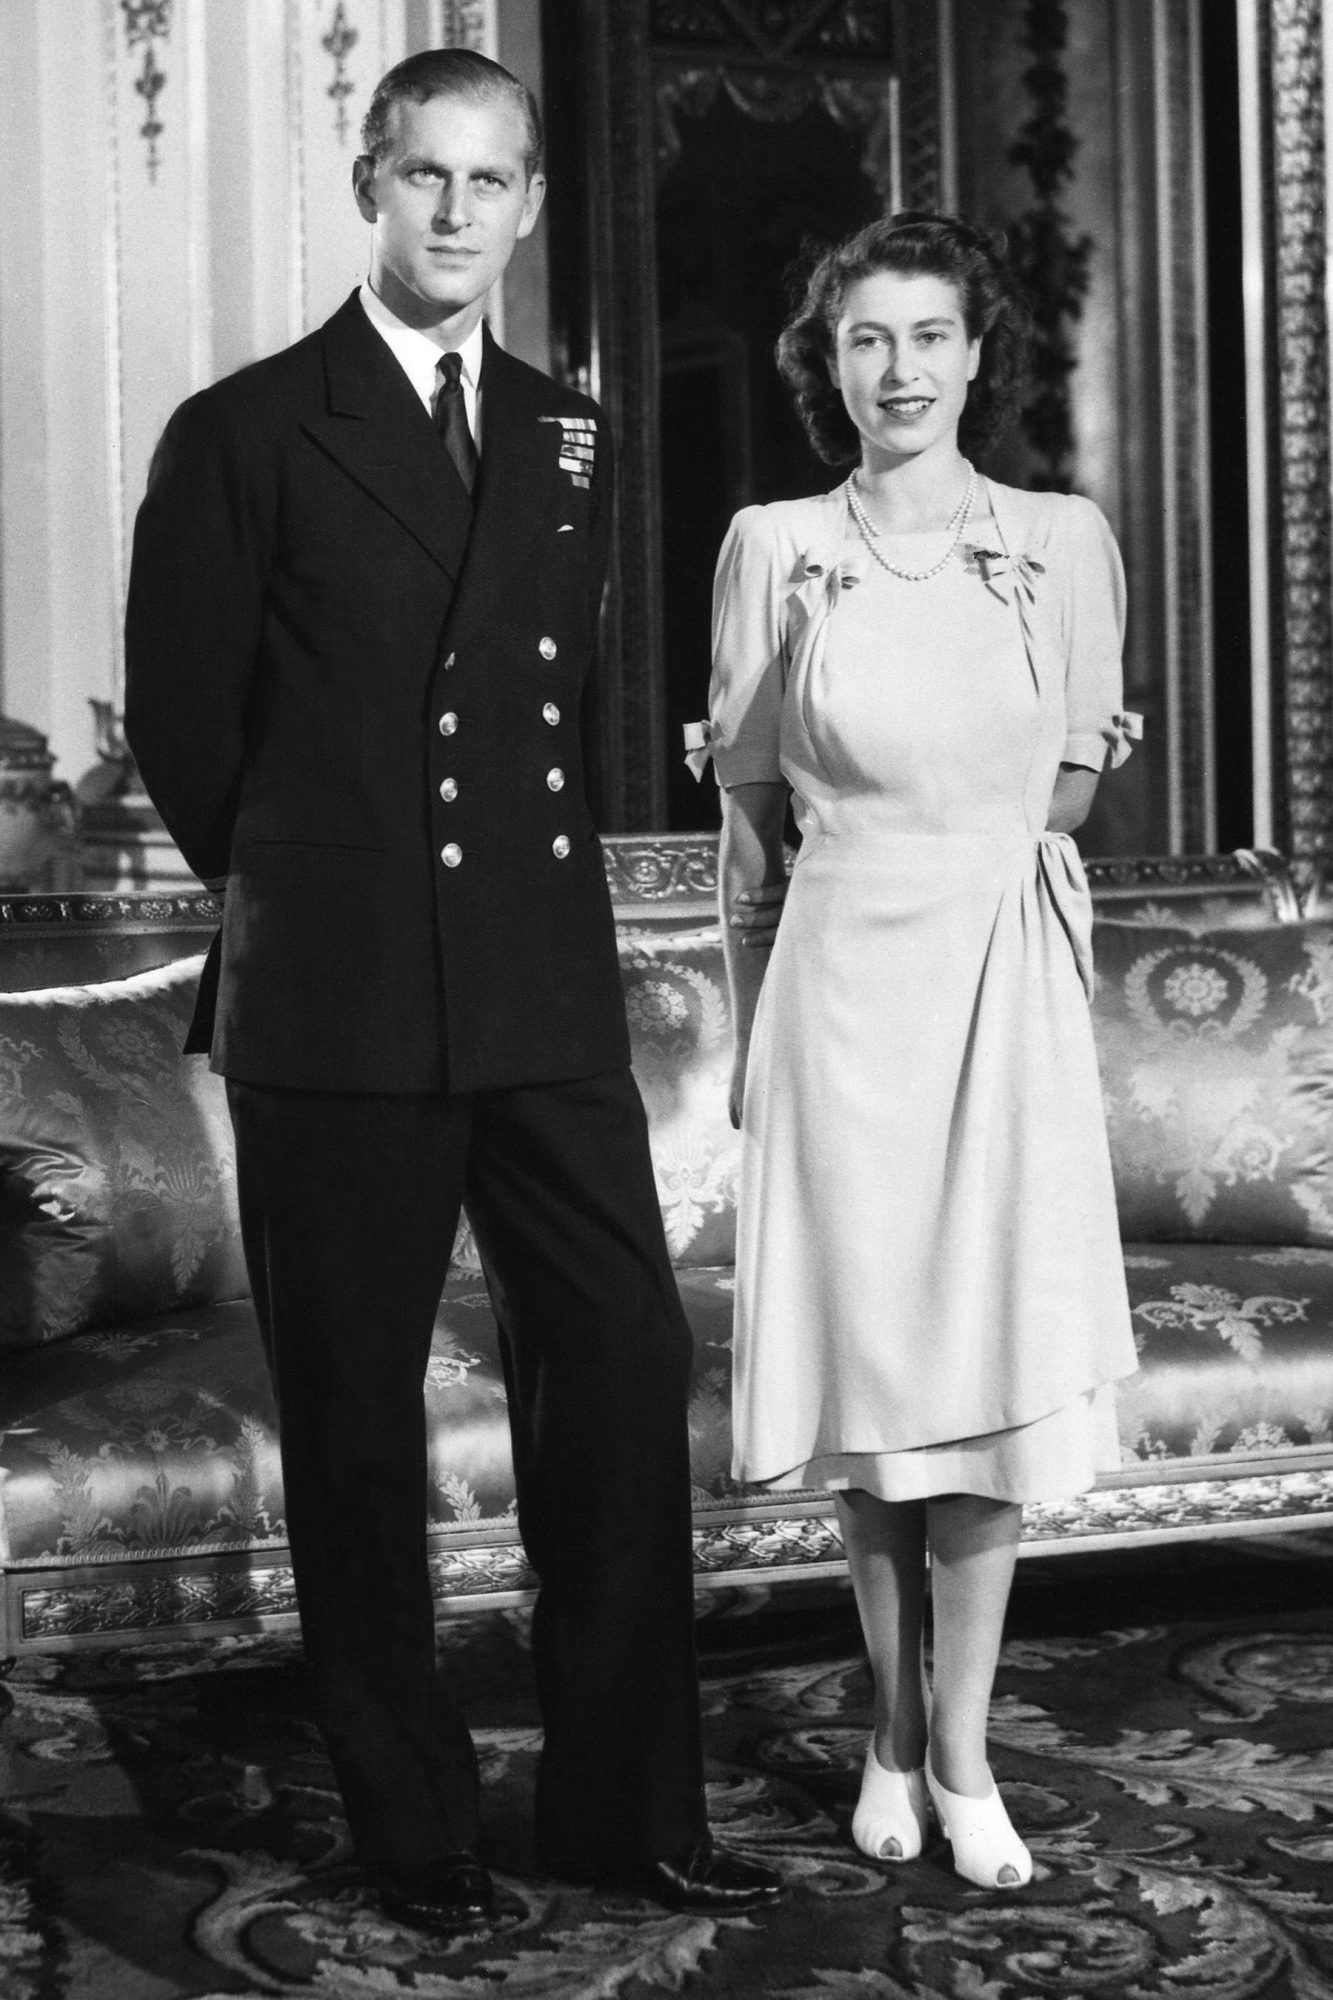 London, Buckingham Palace, Full Portrait Of Princess Elizabeth And Lieutenant Philip Mountbatten In 1947